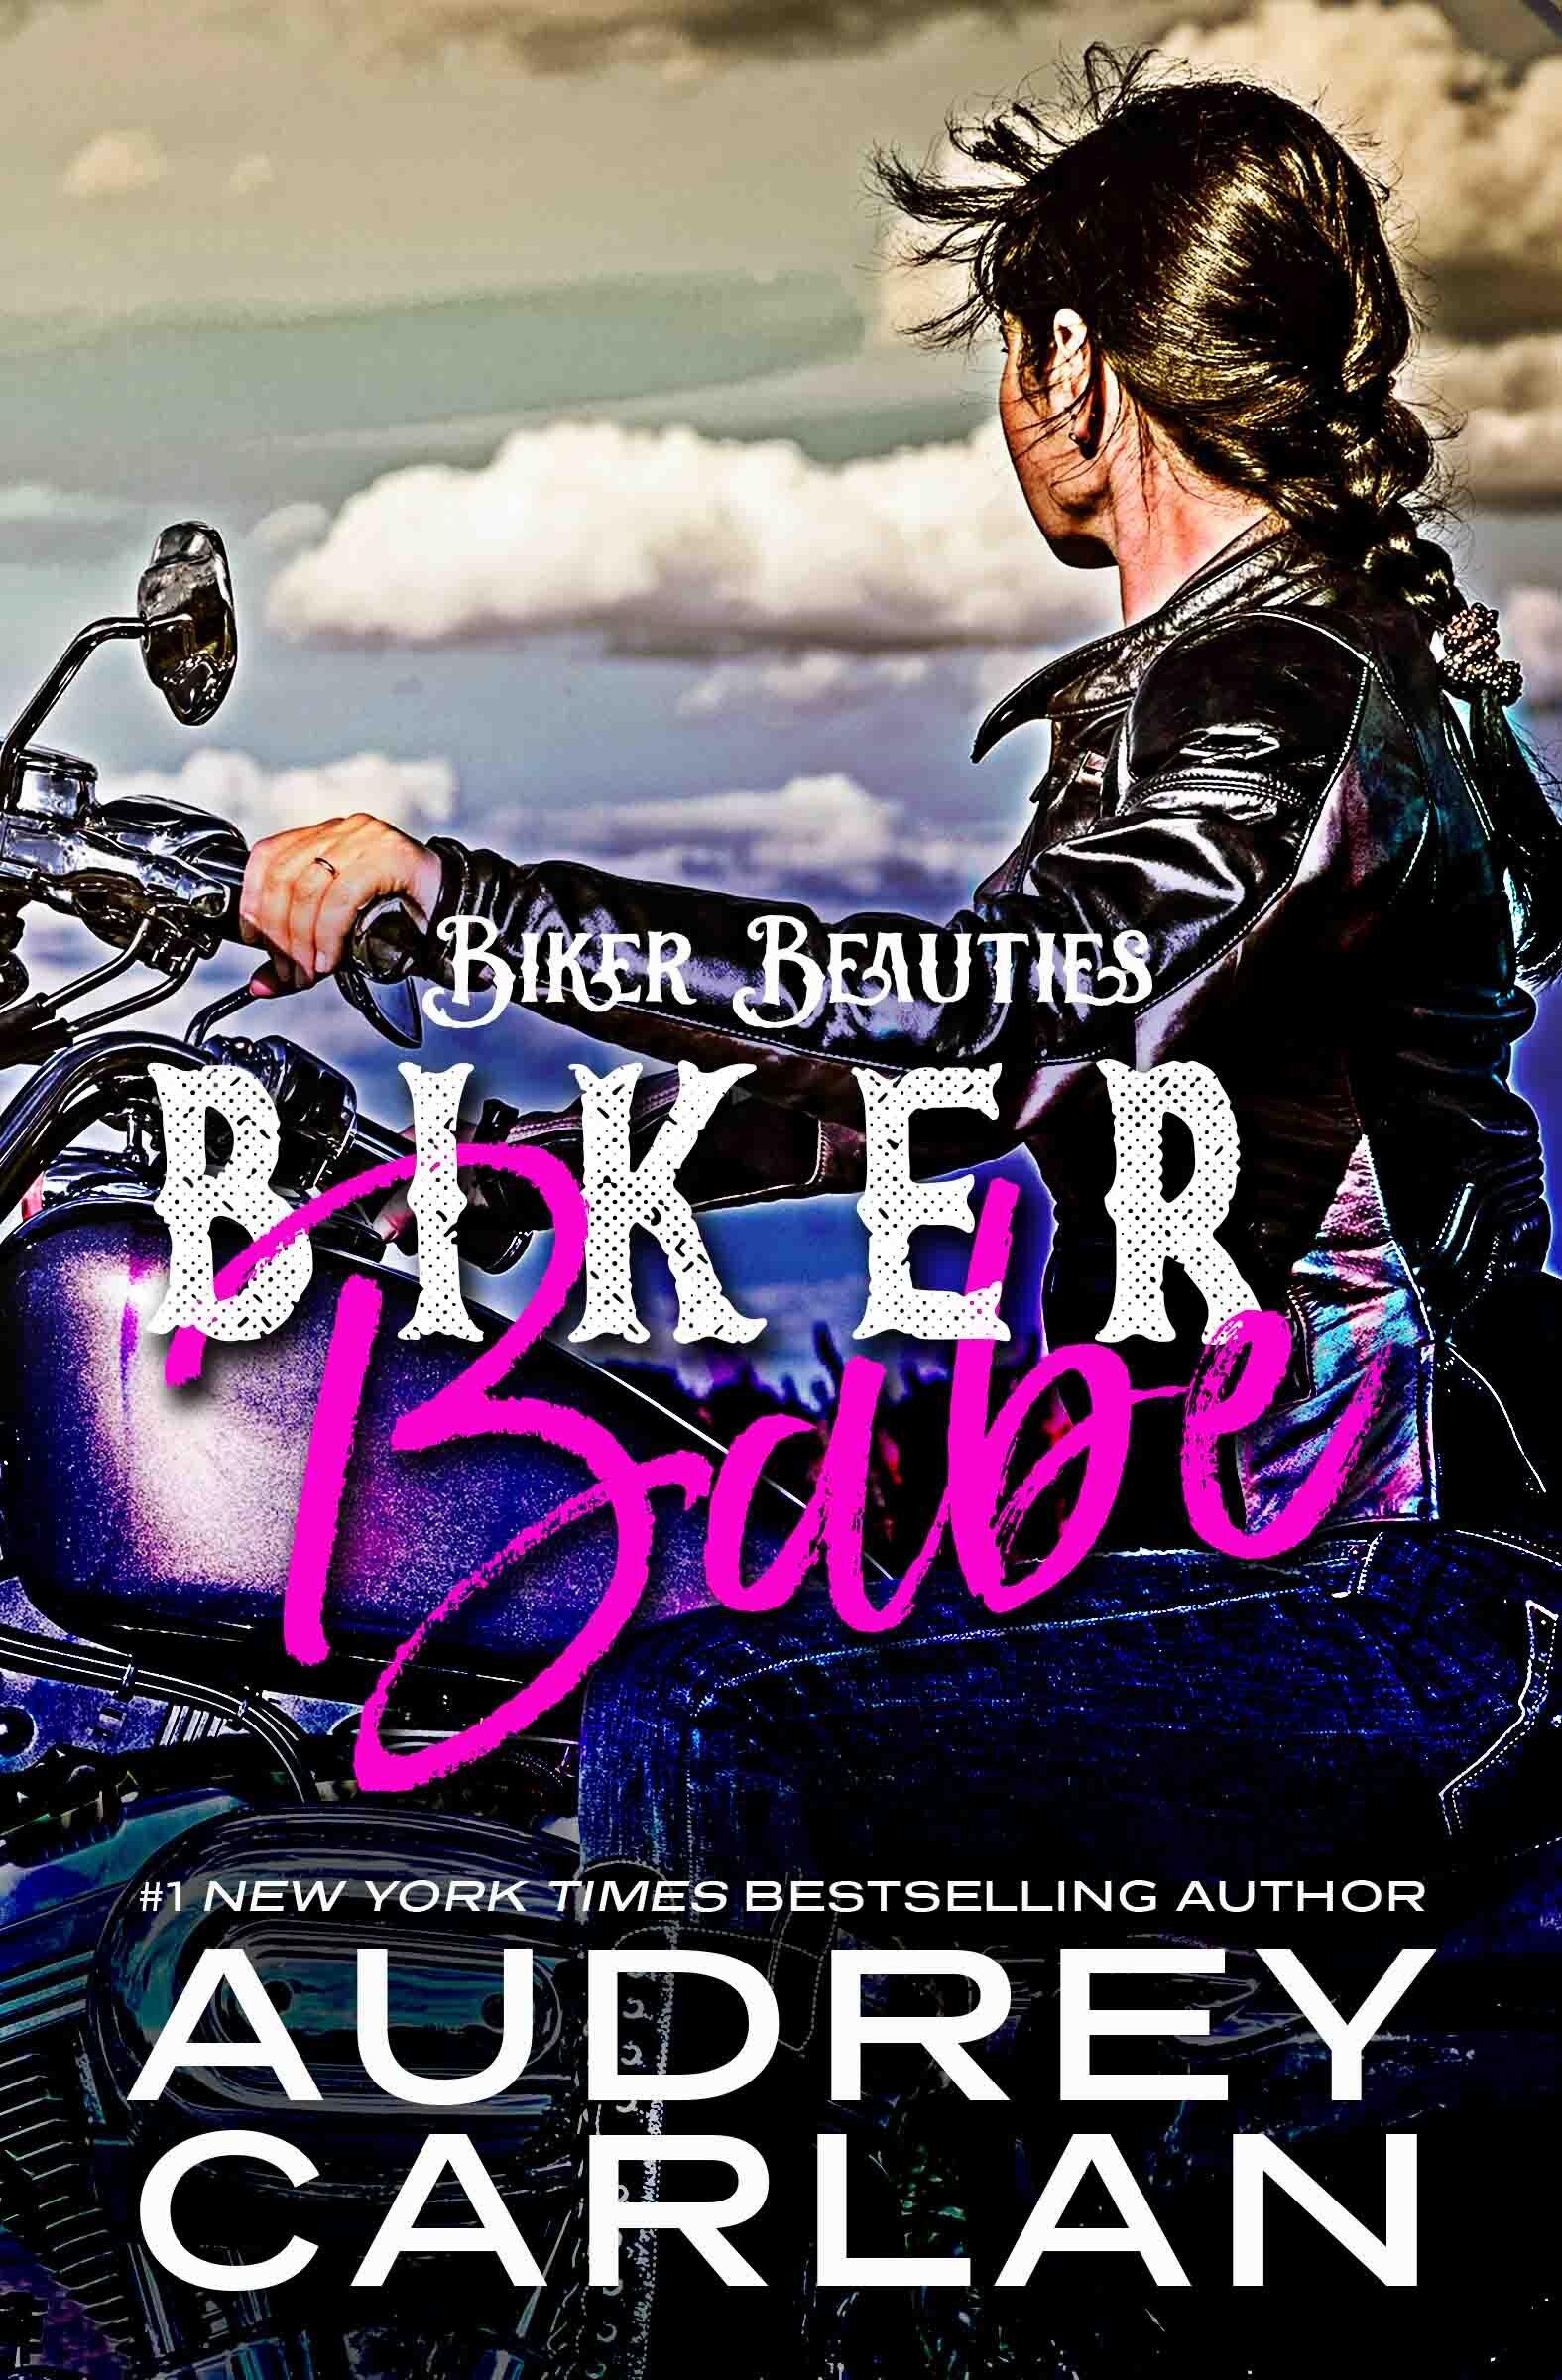 Audrey Carlan Biker Beauties 1 Biker Babe.jpg